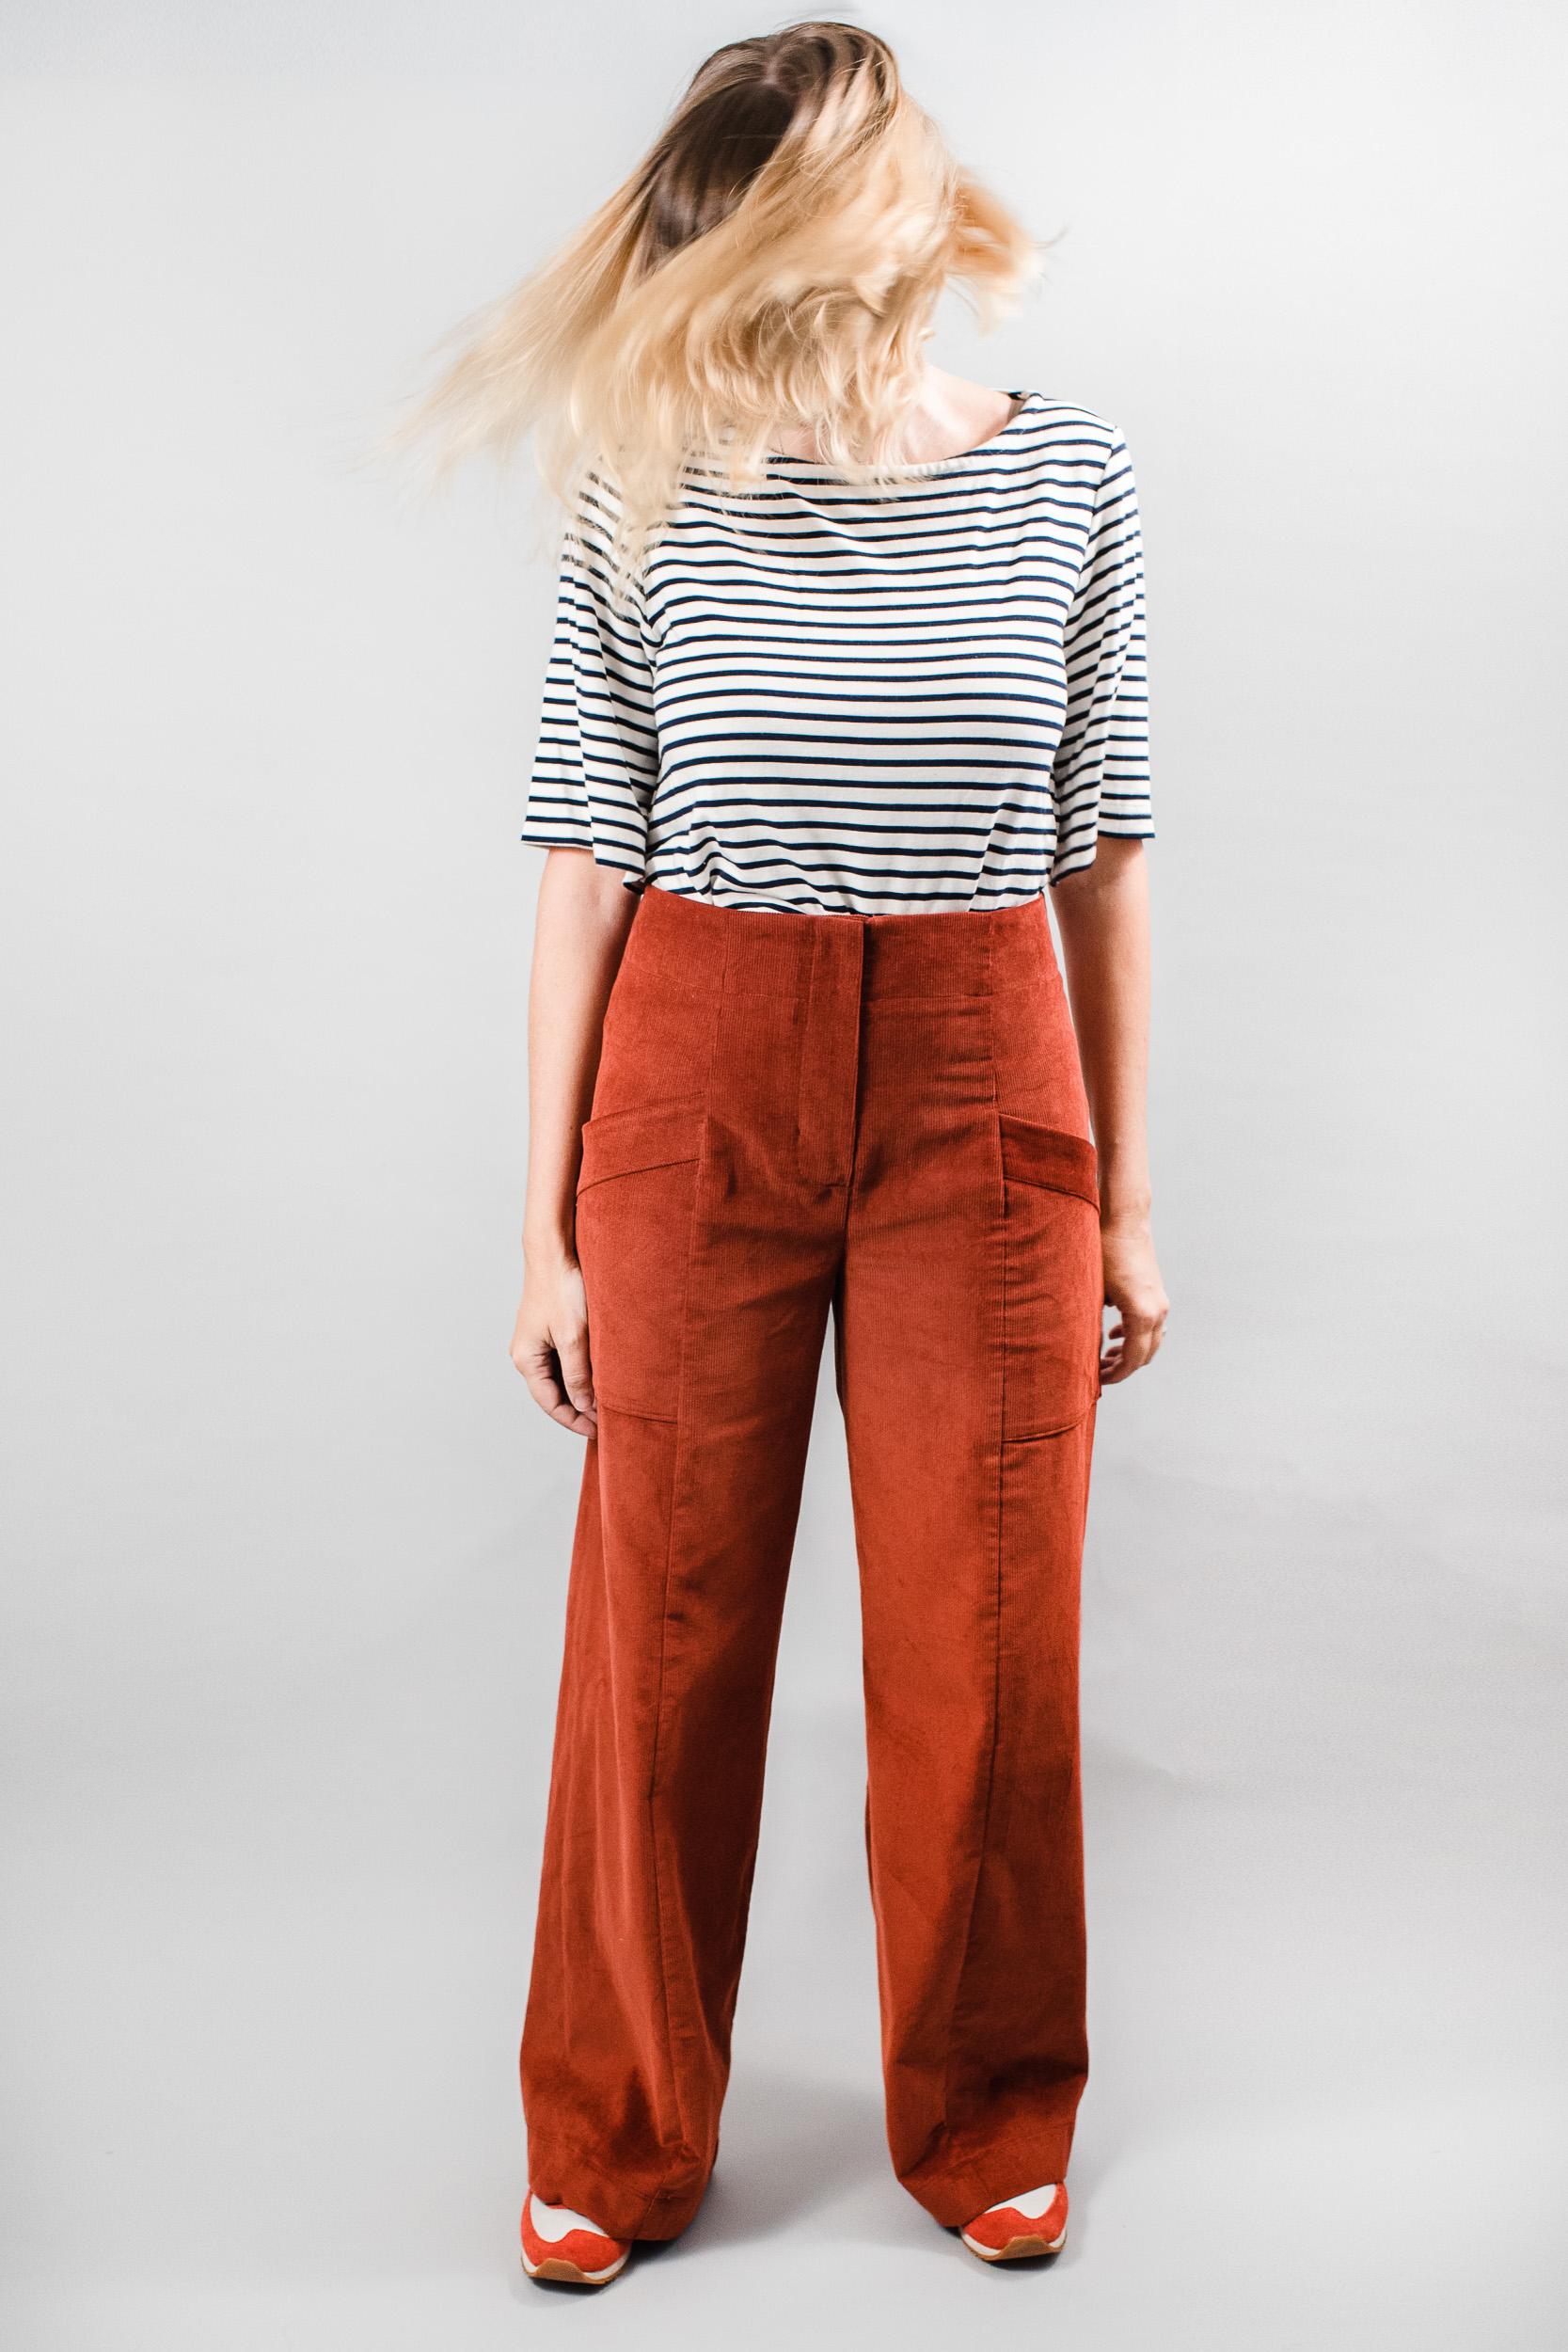 NEW PATTERN RELEASE - Parasol Trousers & Jumpsuit